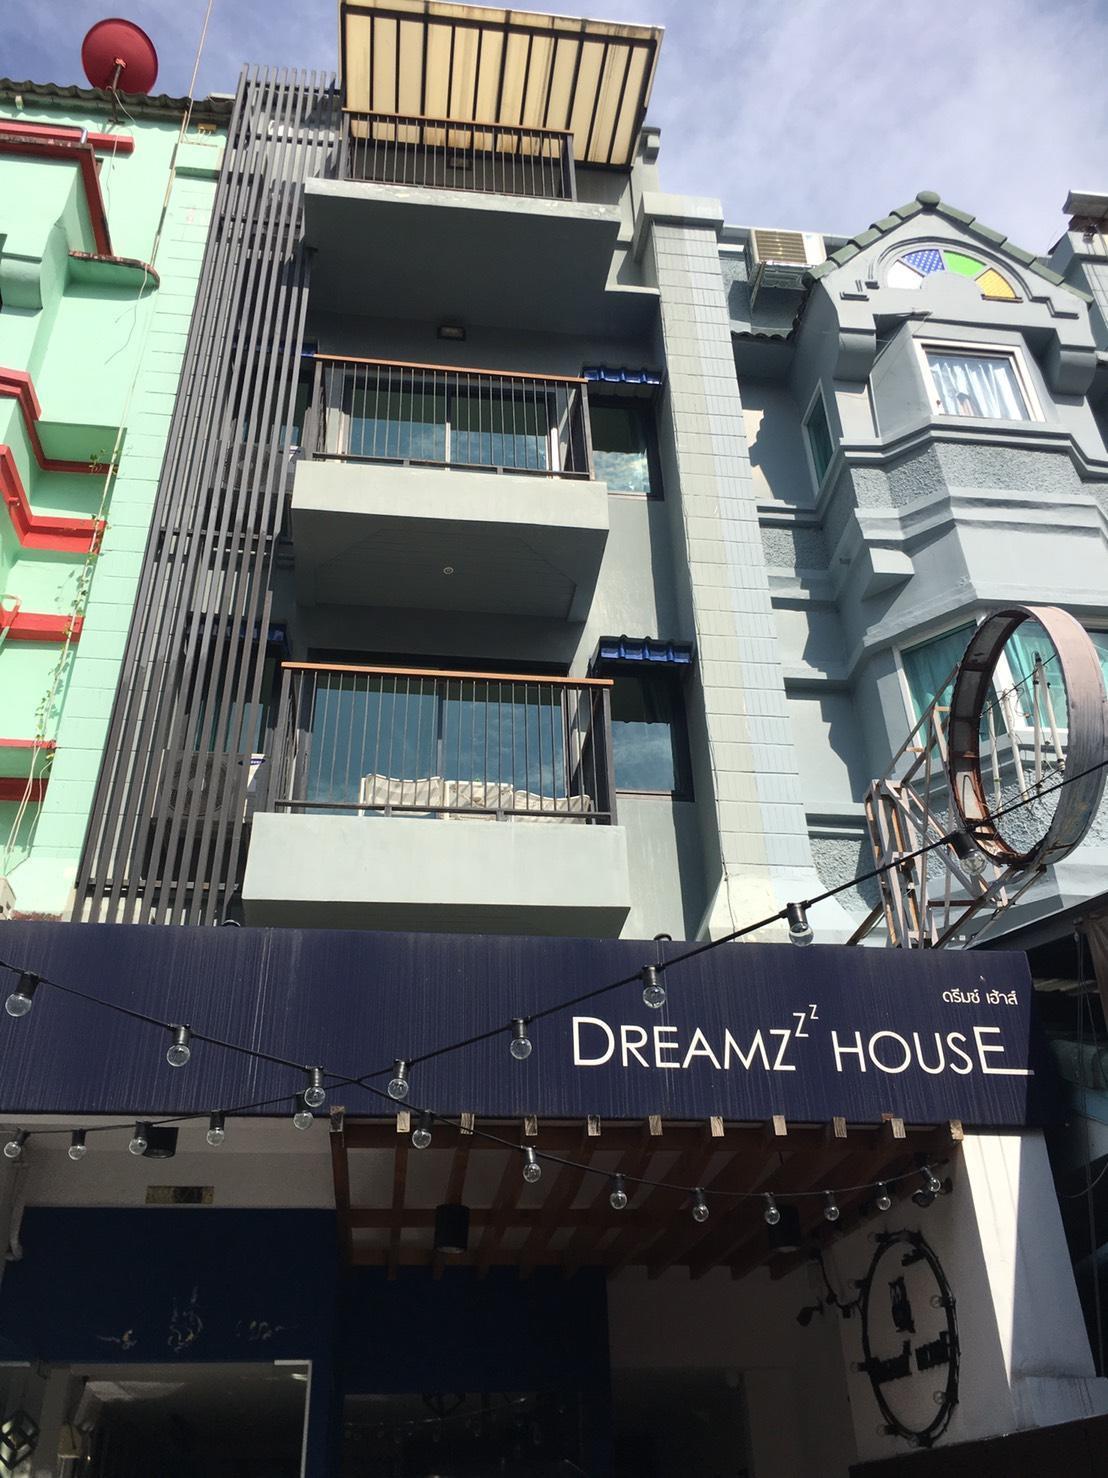 Dreamz House Boutique ดรีมซ์ เฮาส์ บูทิก